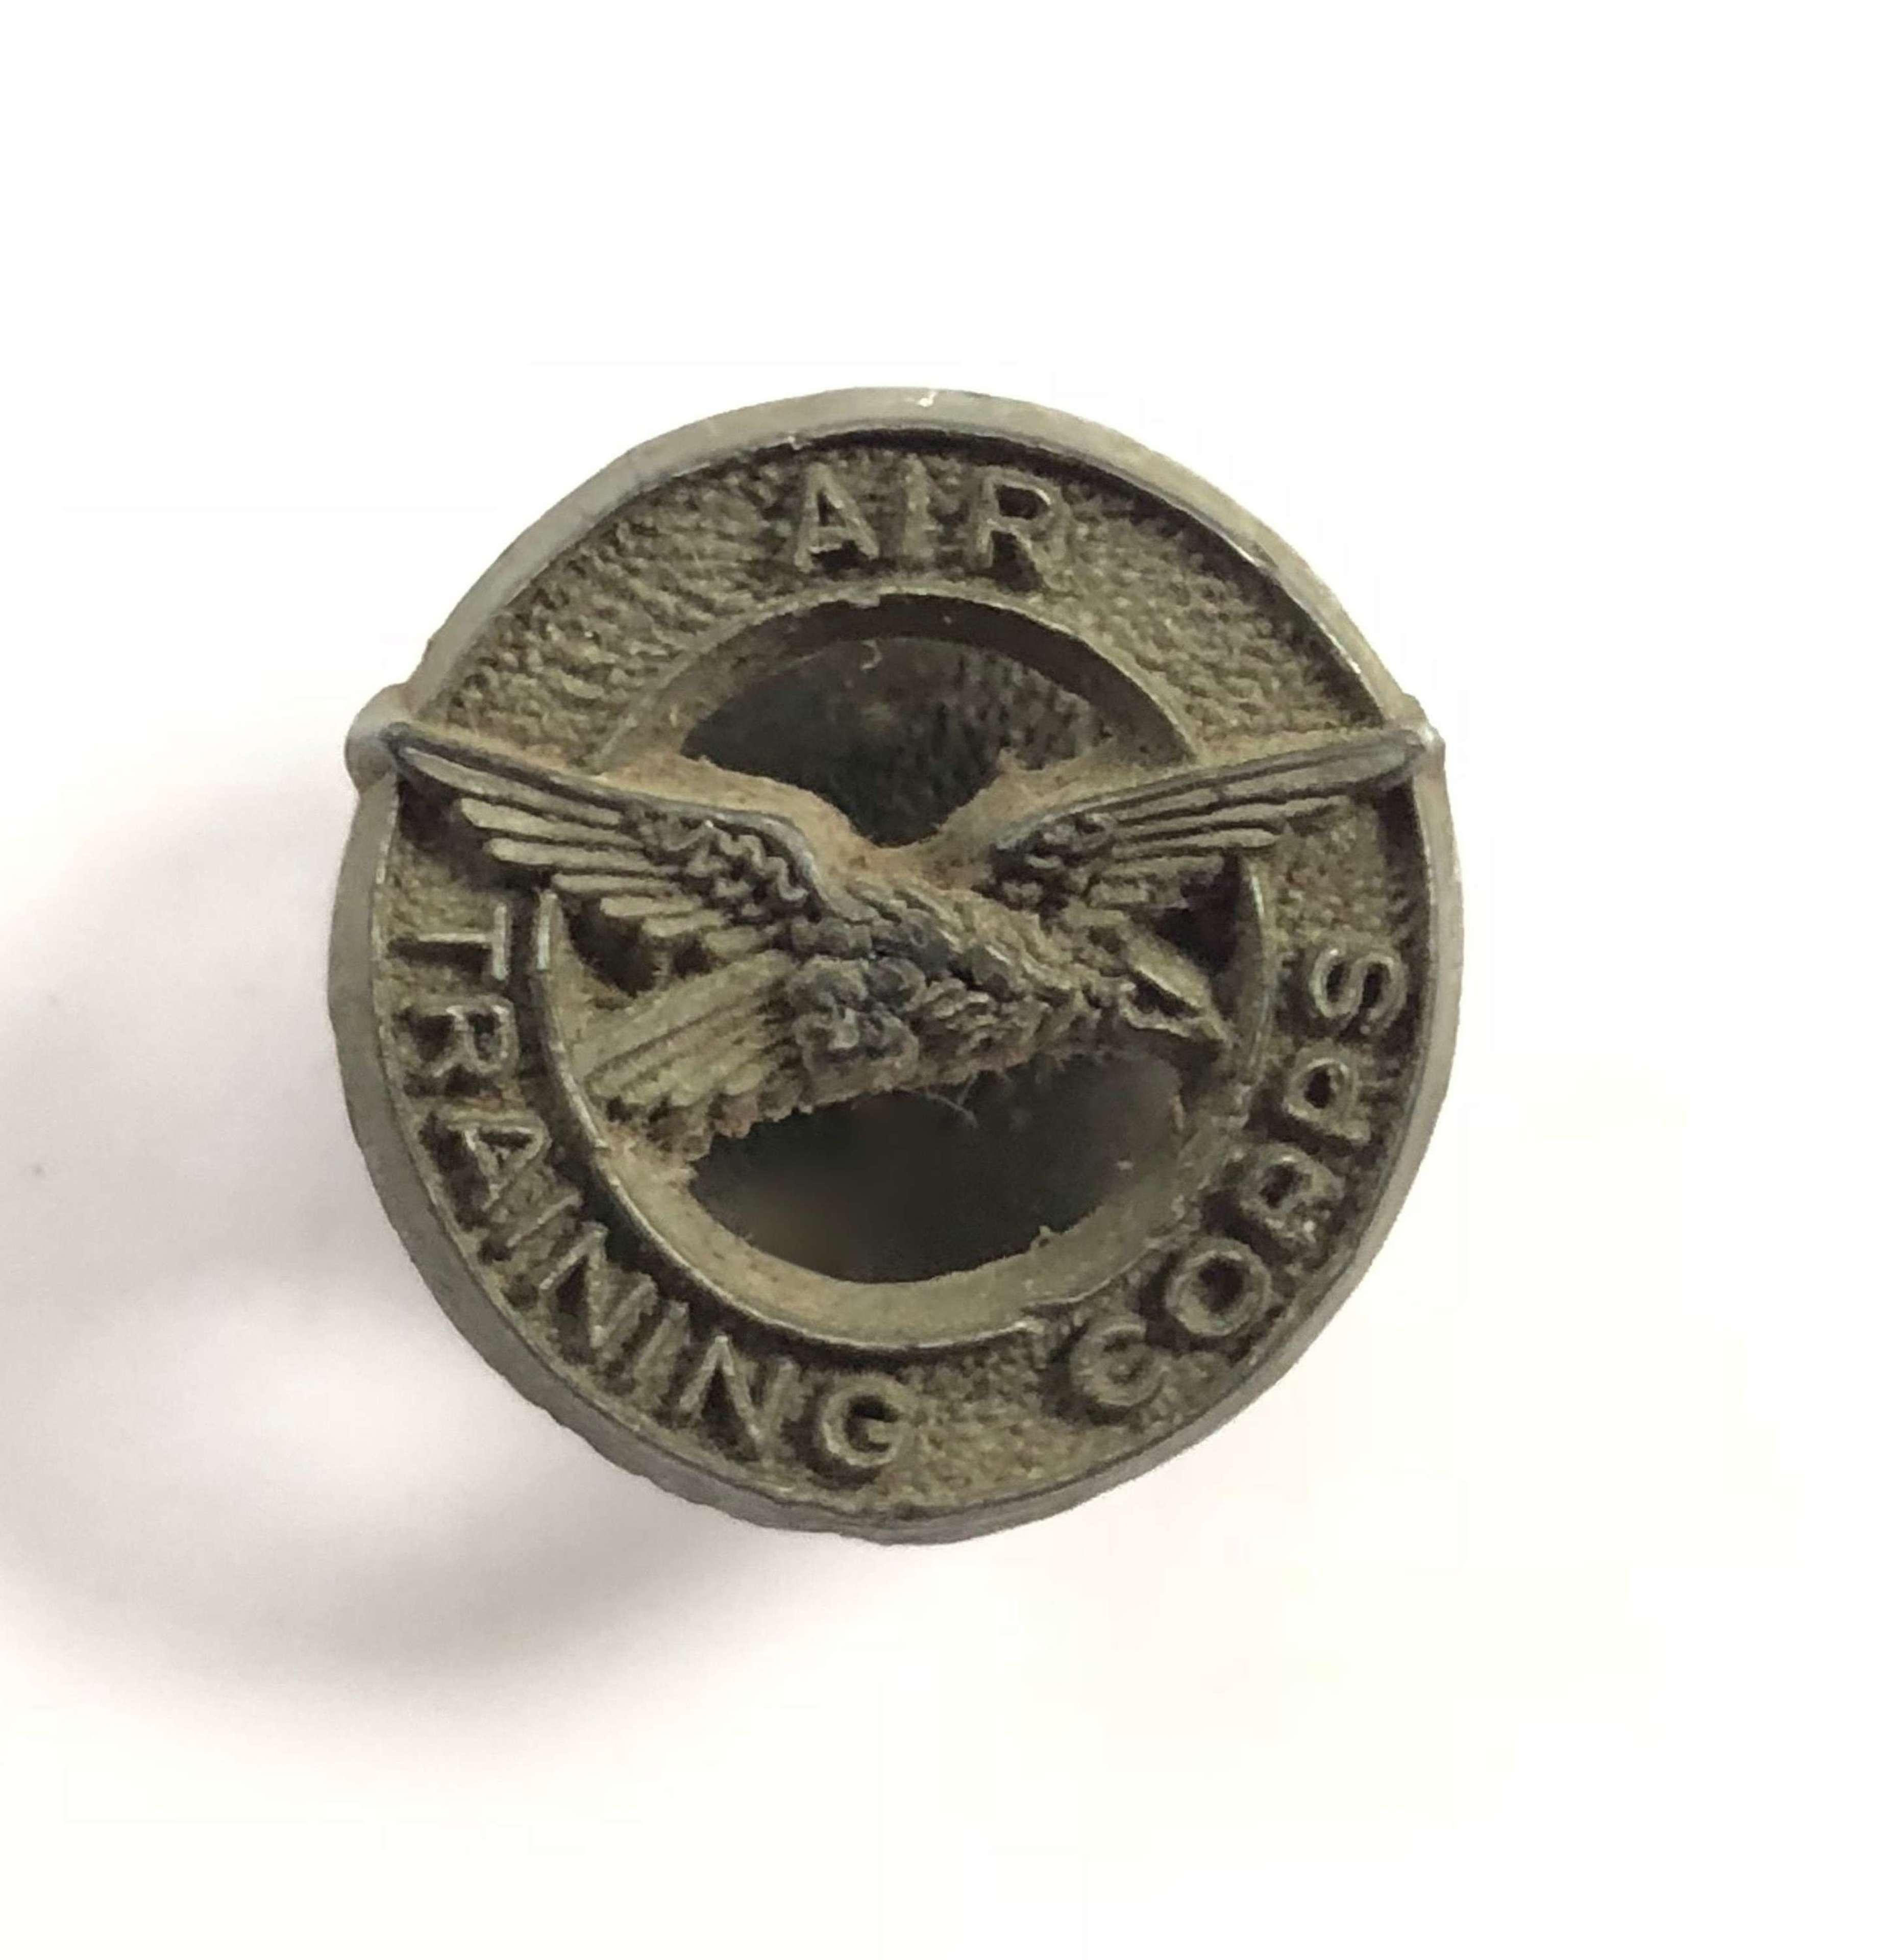 WW2 RAF Air Training Corps Plastic Bakerlite Economy Lapel Badge.